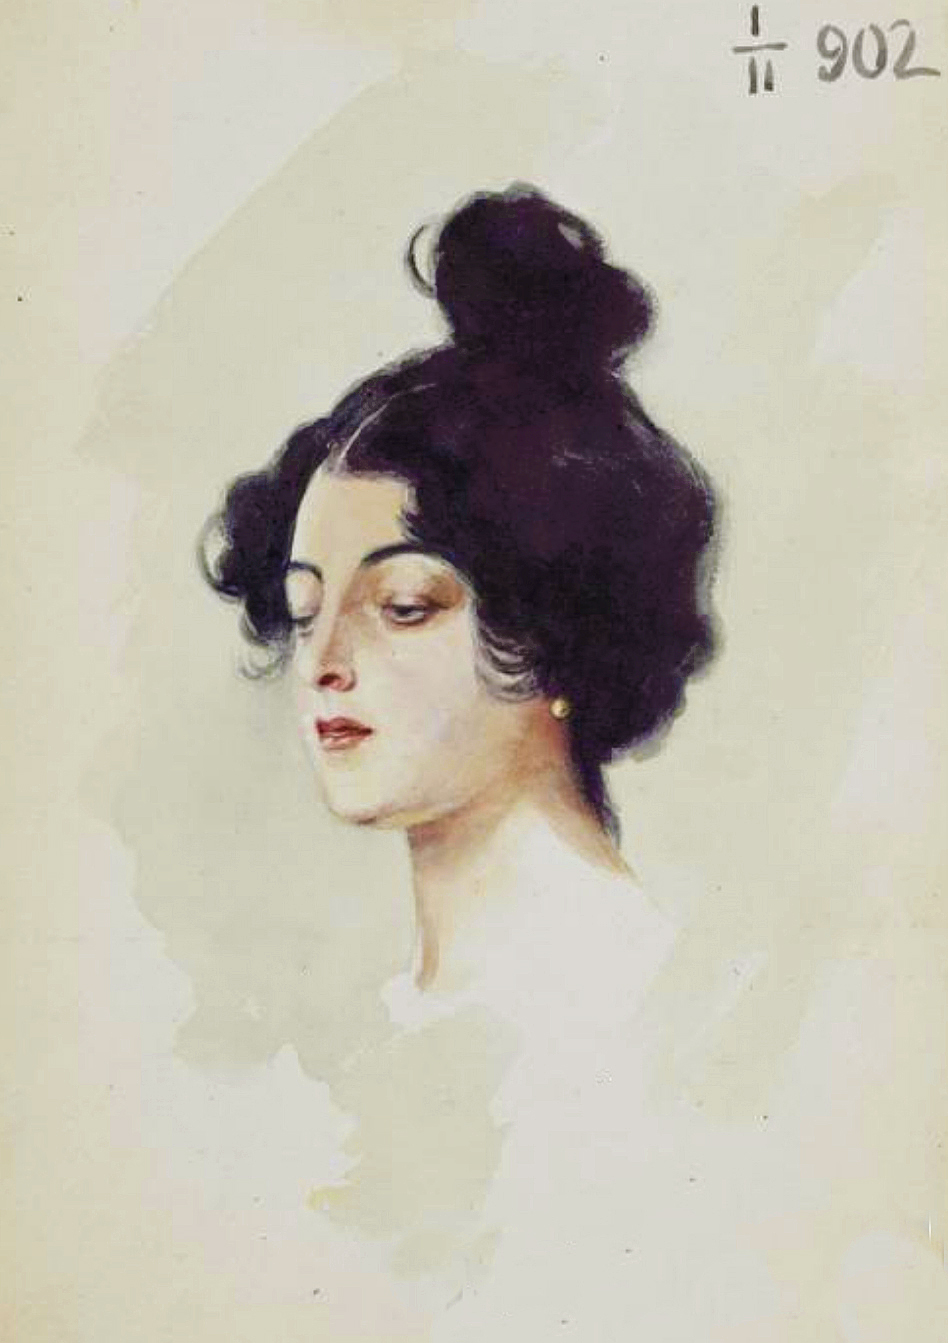 Гелена Ланг. Етюд голови, 1902